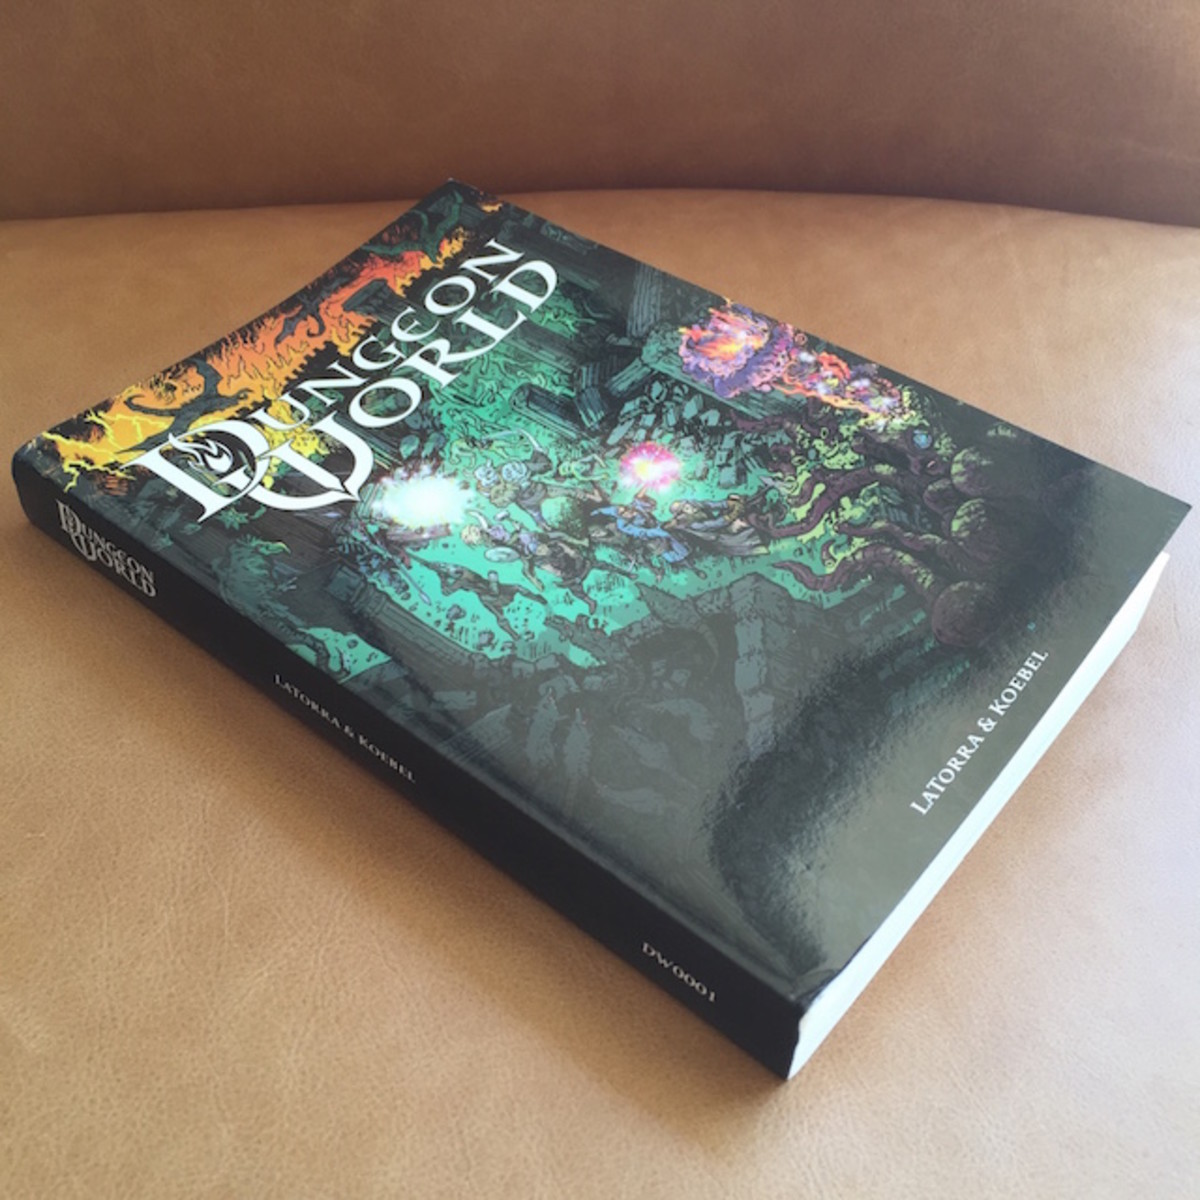 Dungeon World is written by Sage LaTorra and Adam Koebel